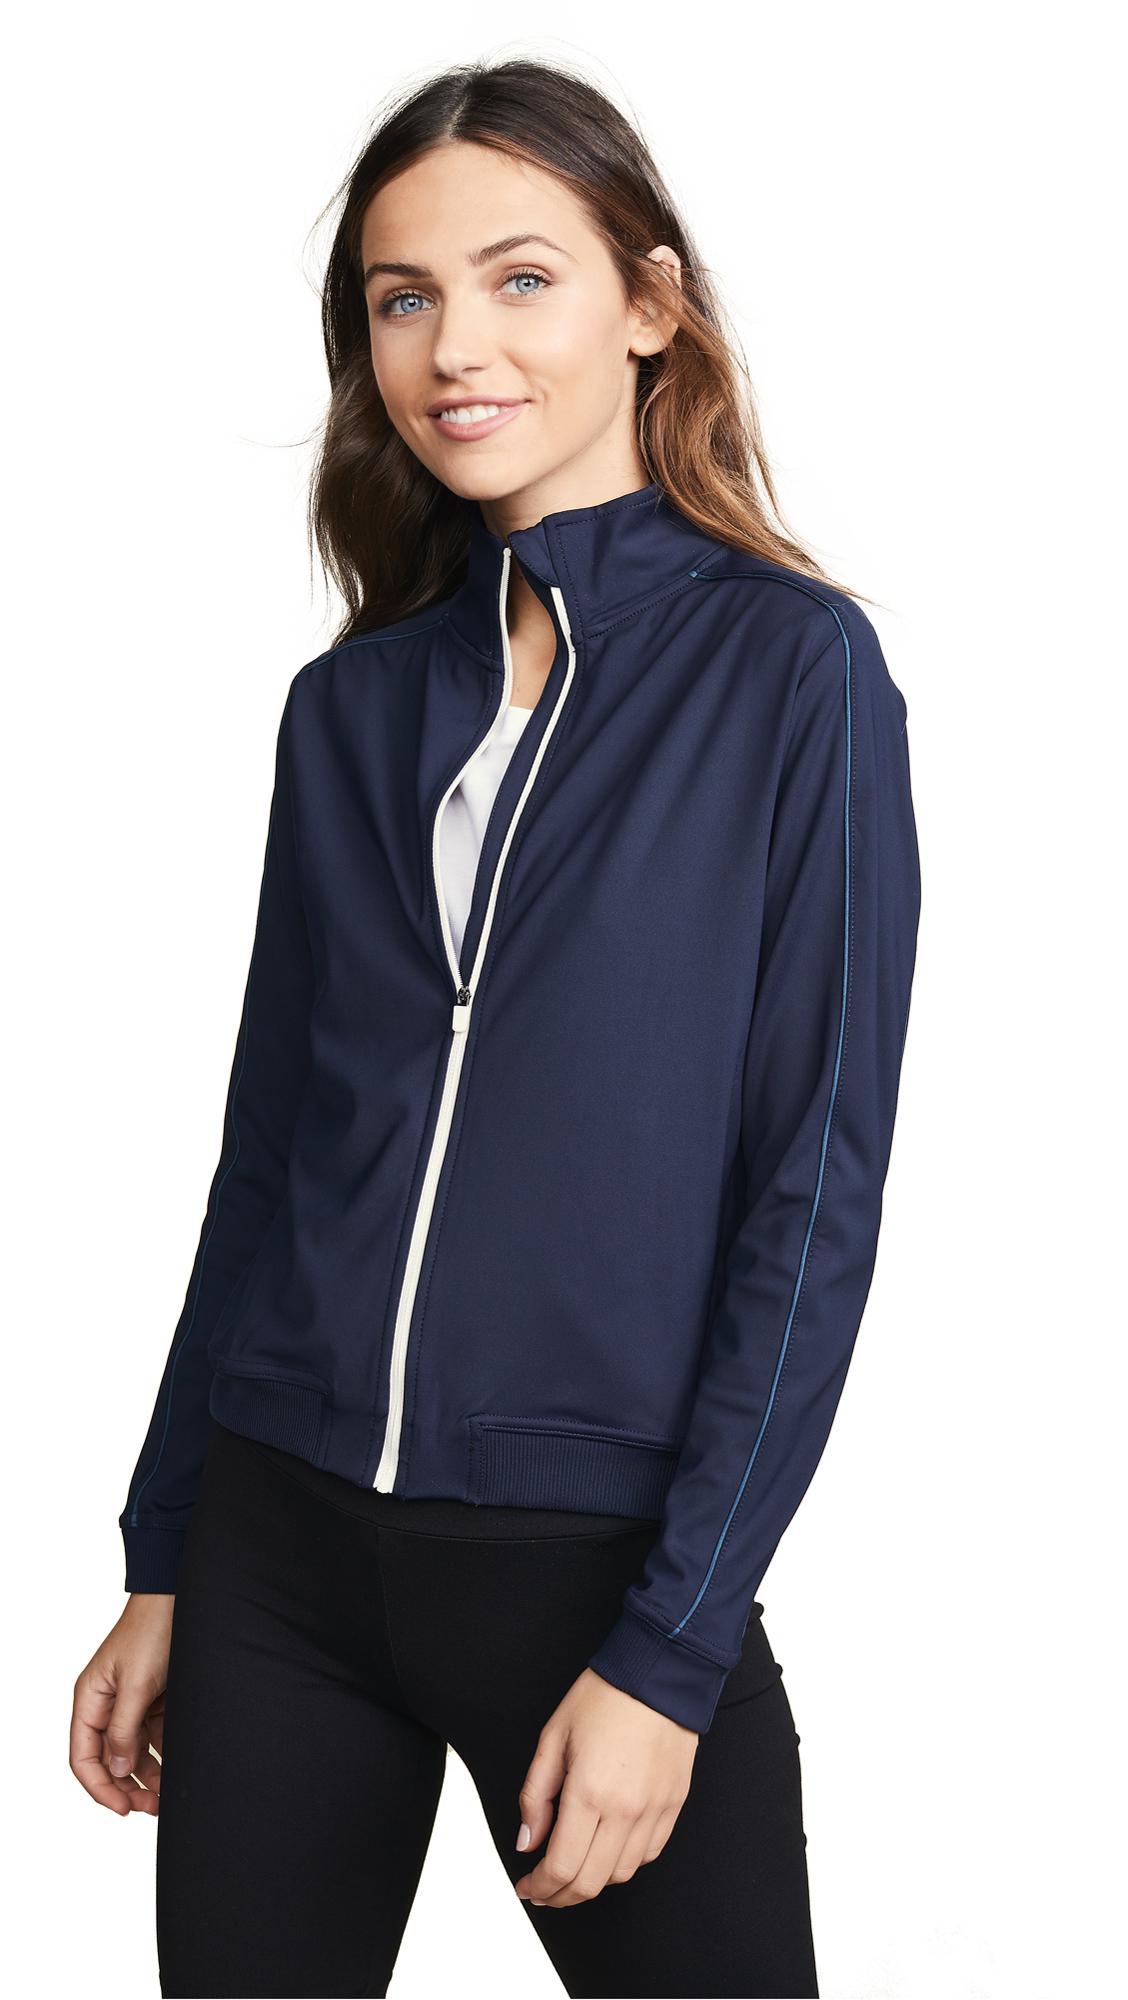 SPLITS59 Fame Jacket in Indigo/Off White